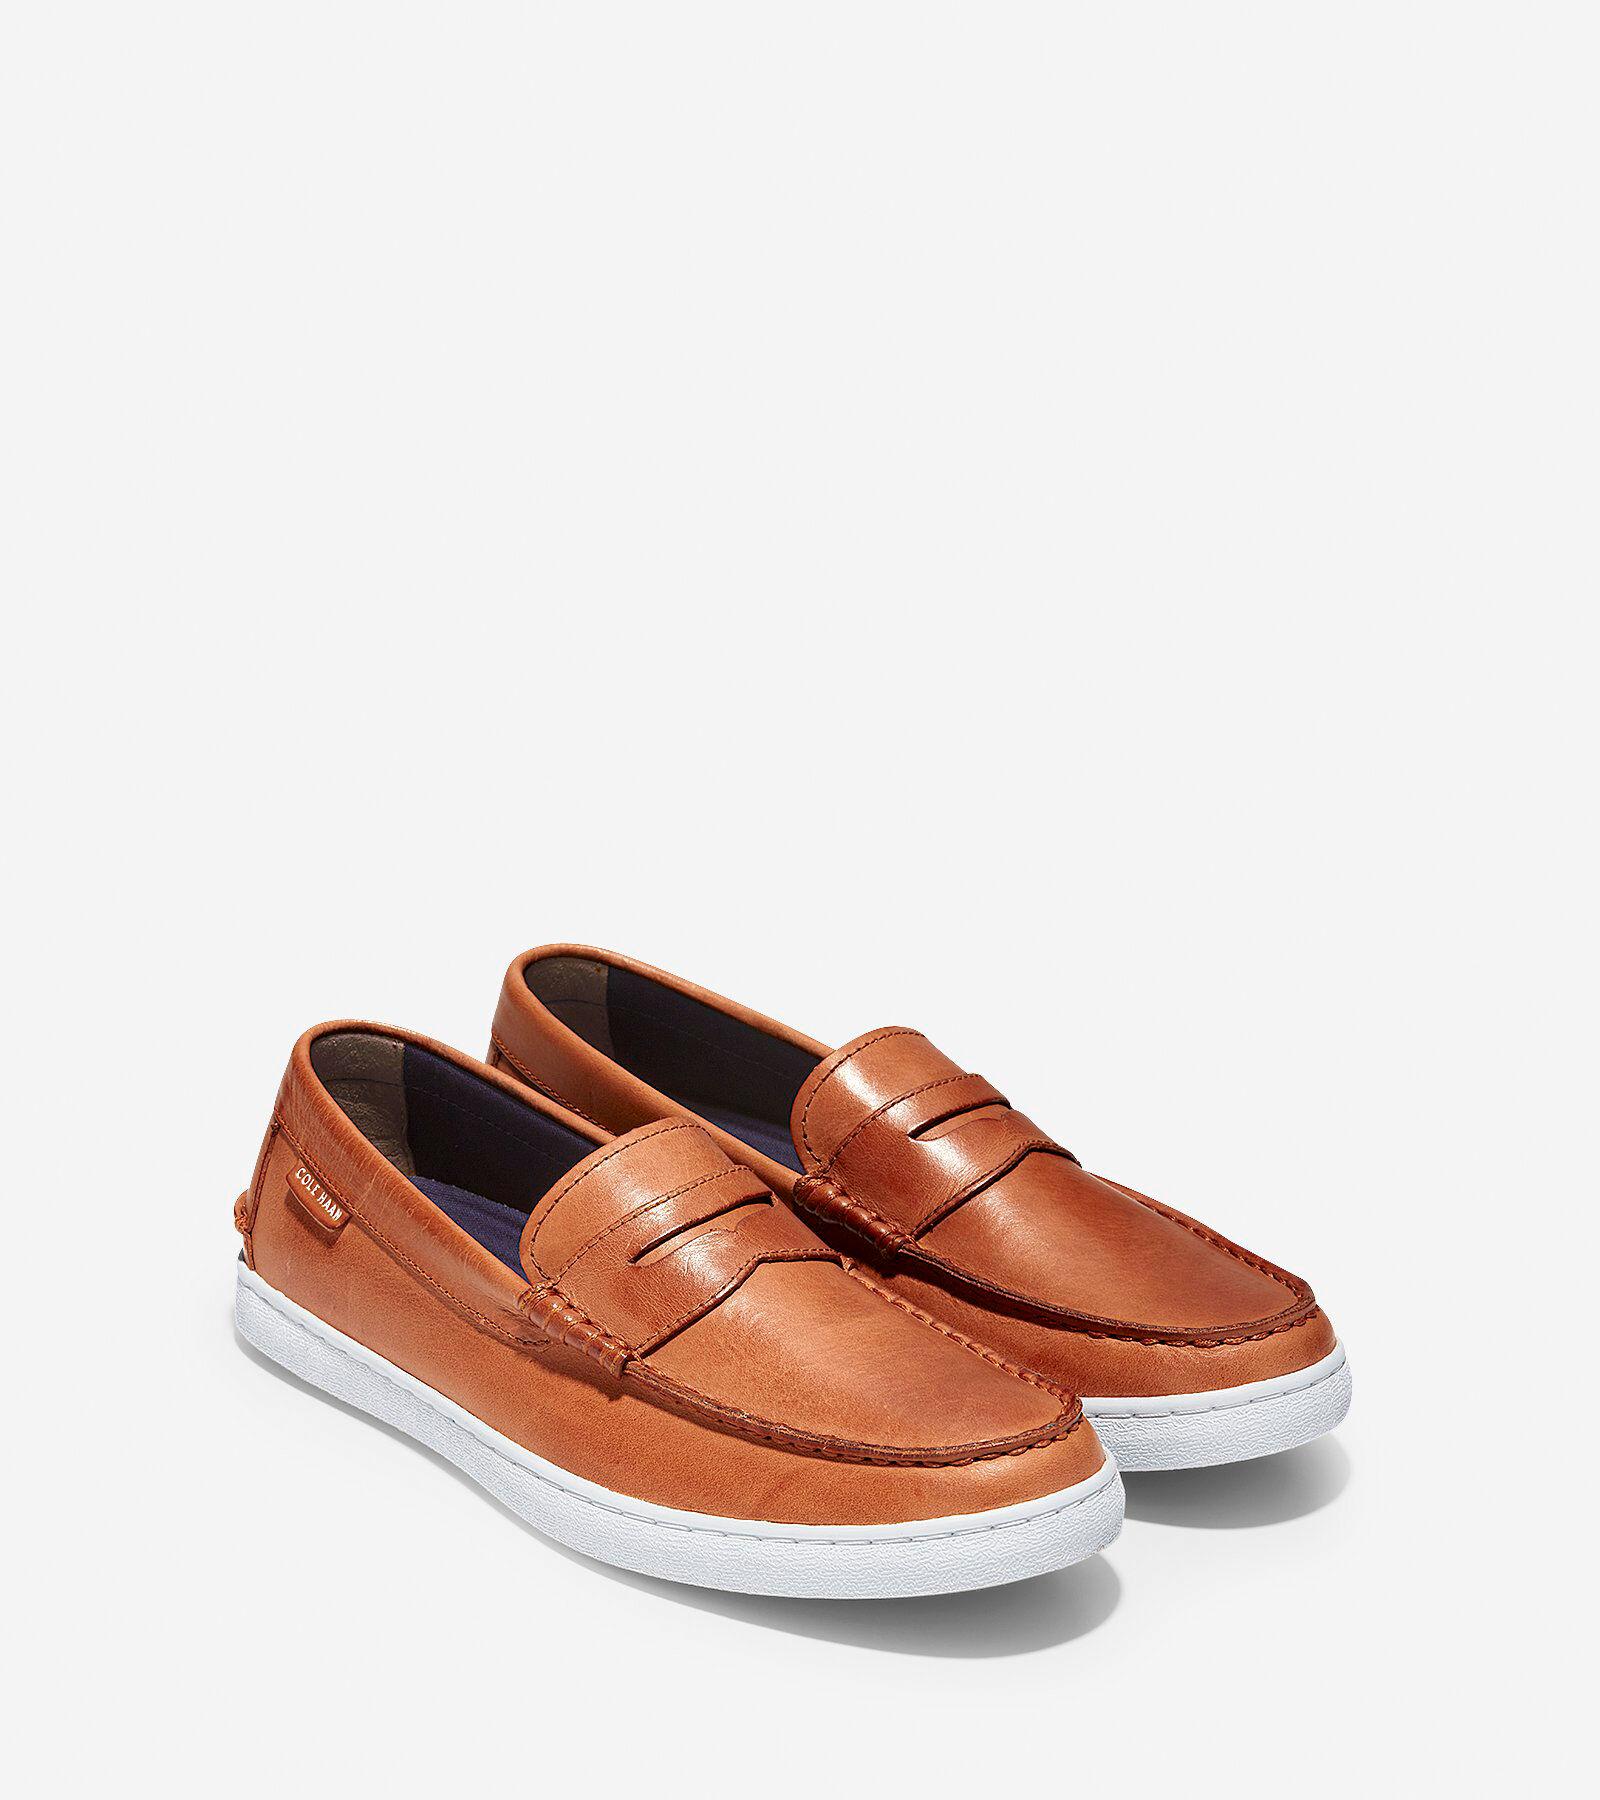 cole haan men's nantucket loafer black